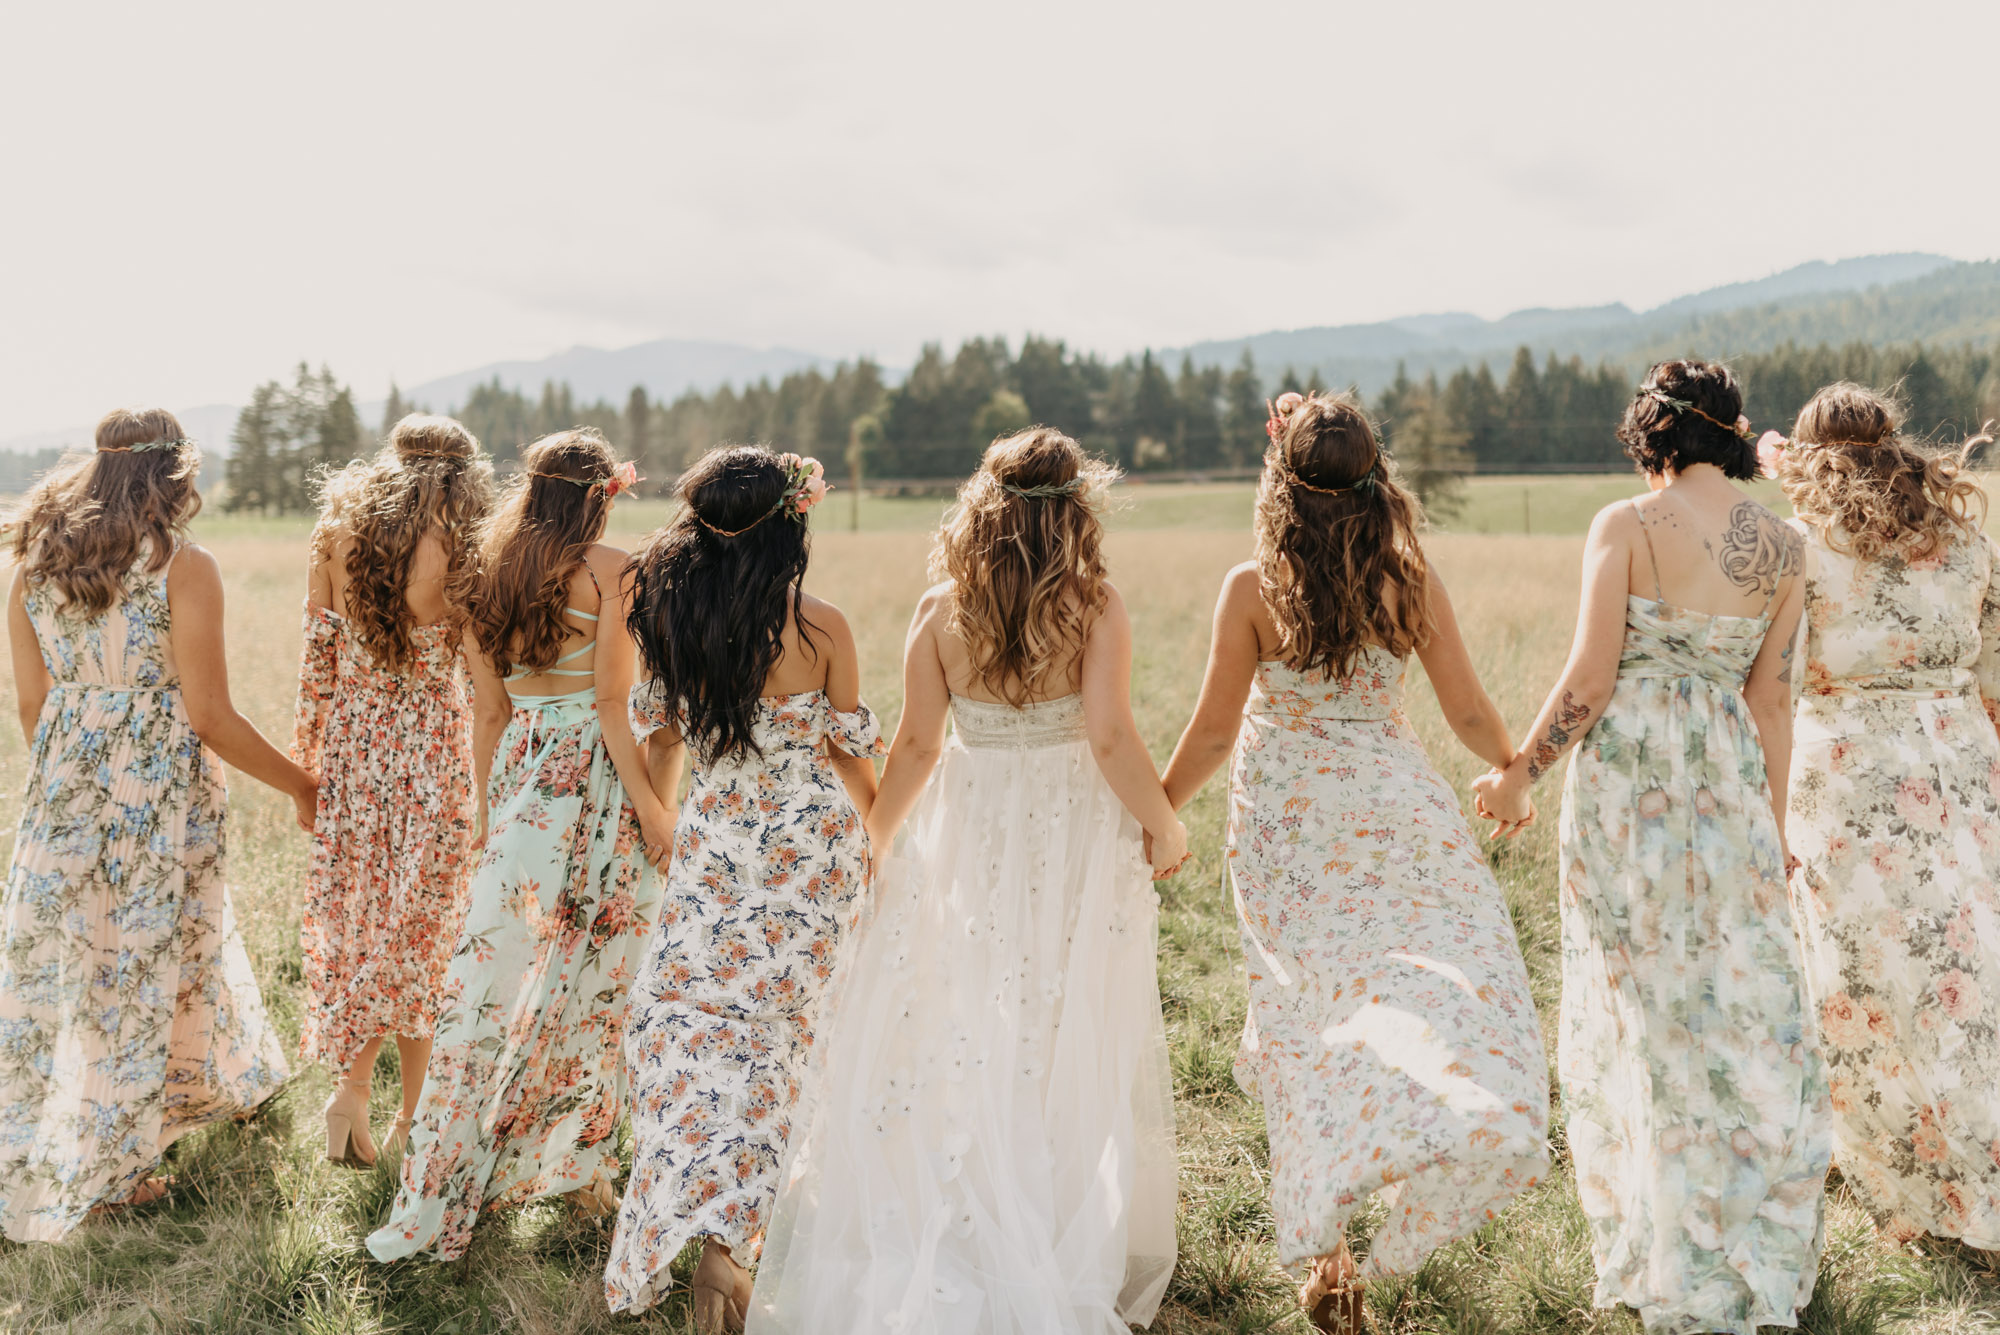 Bridal-Party-Free-People-Flower-Dresses-Washington-Wedding-8527.jpg